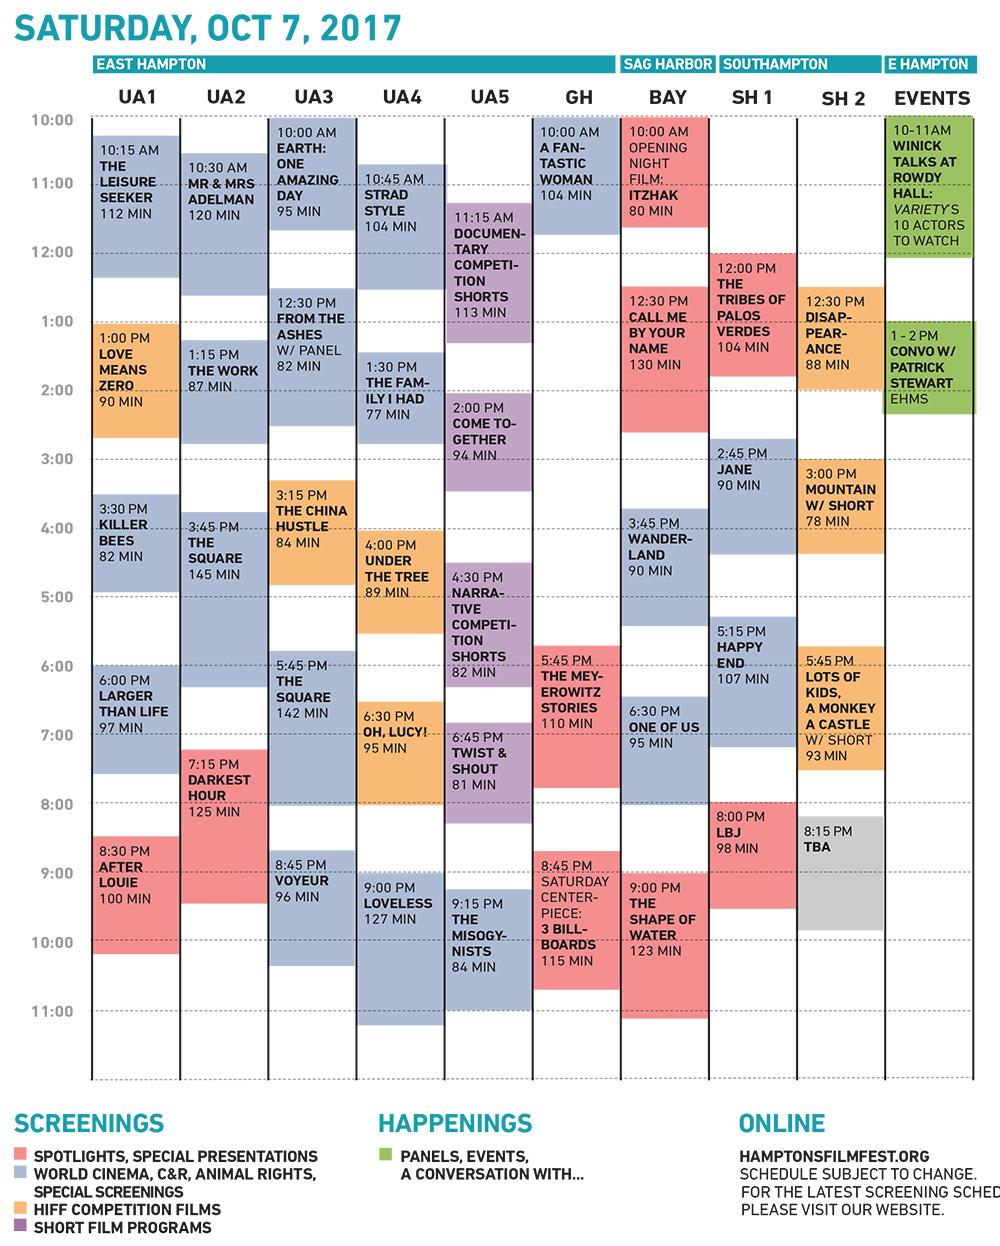 HIFF25 Saturday Grid 10-6